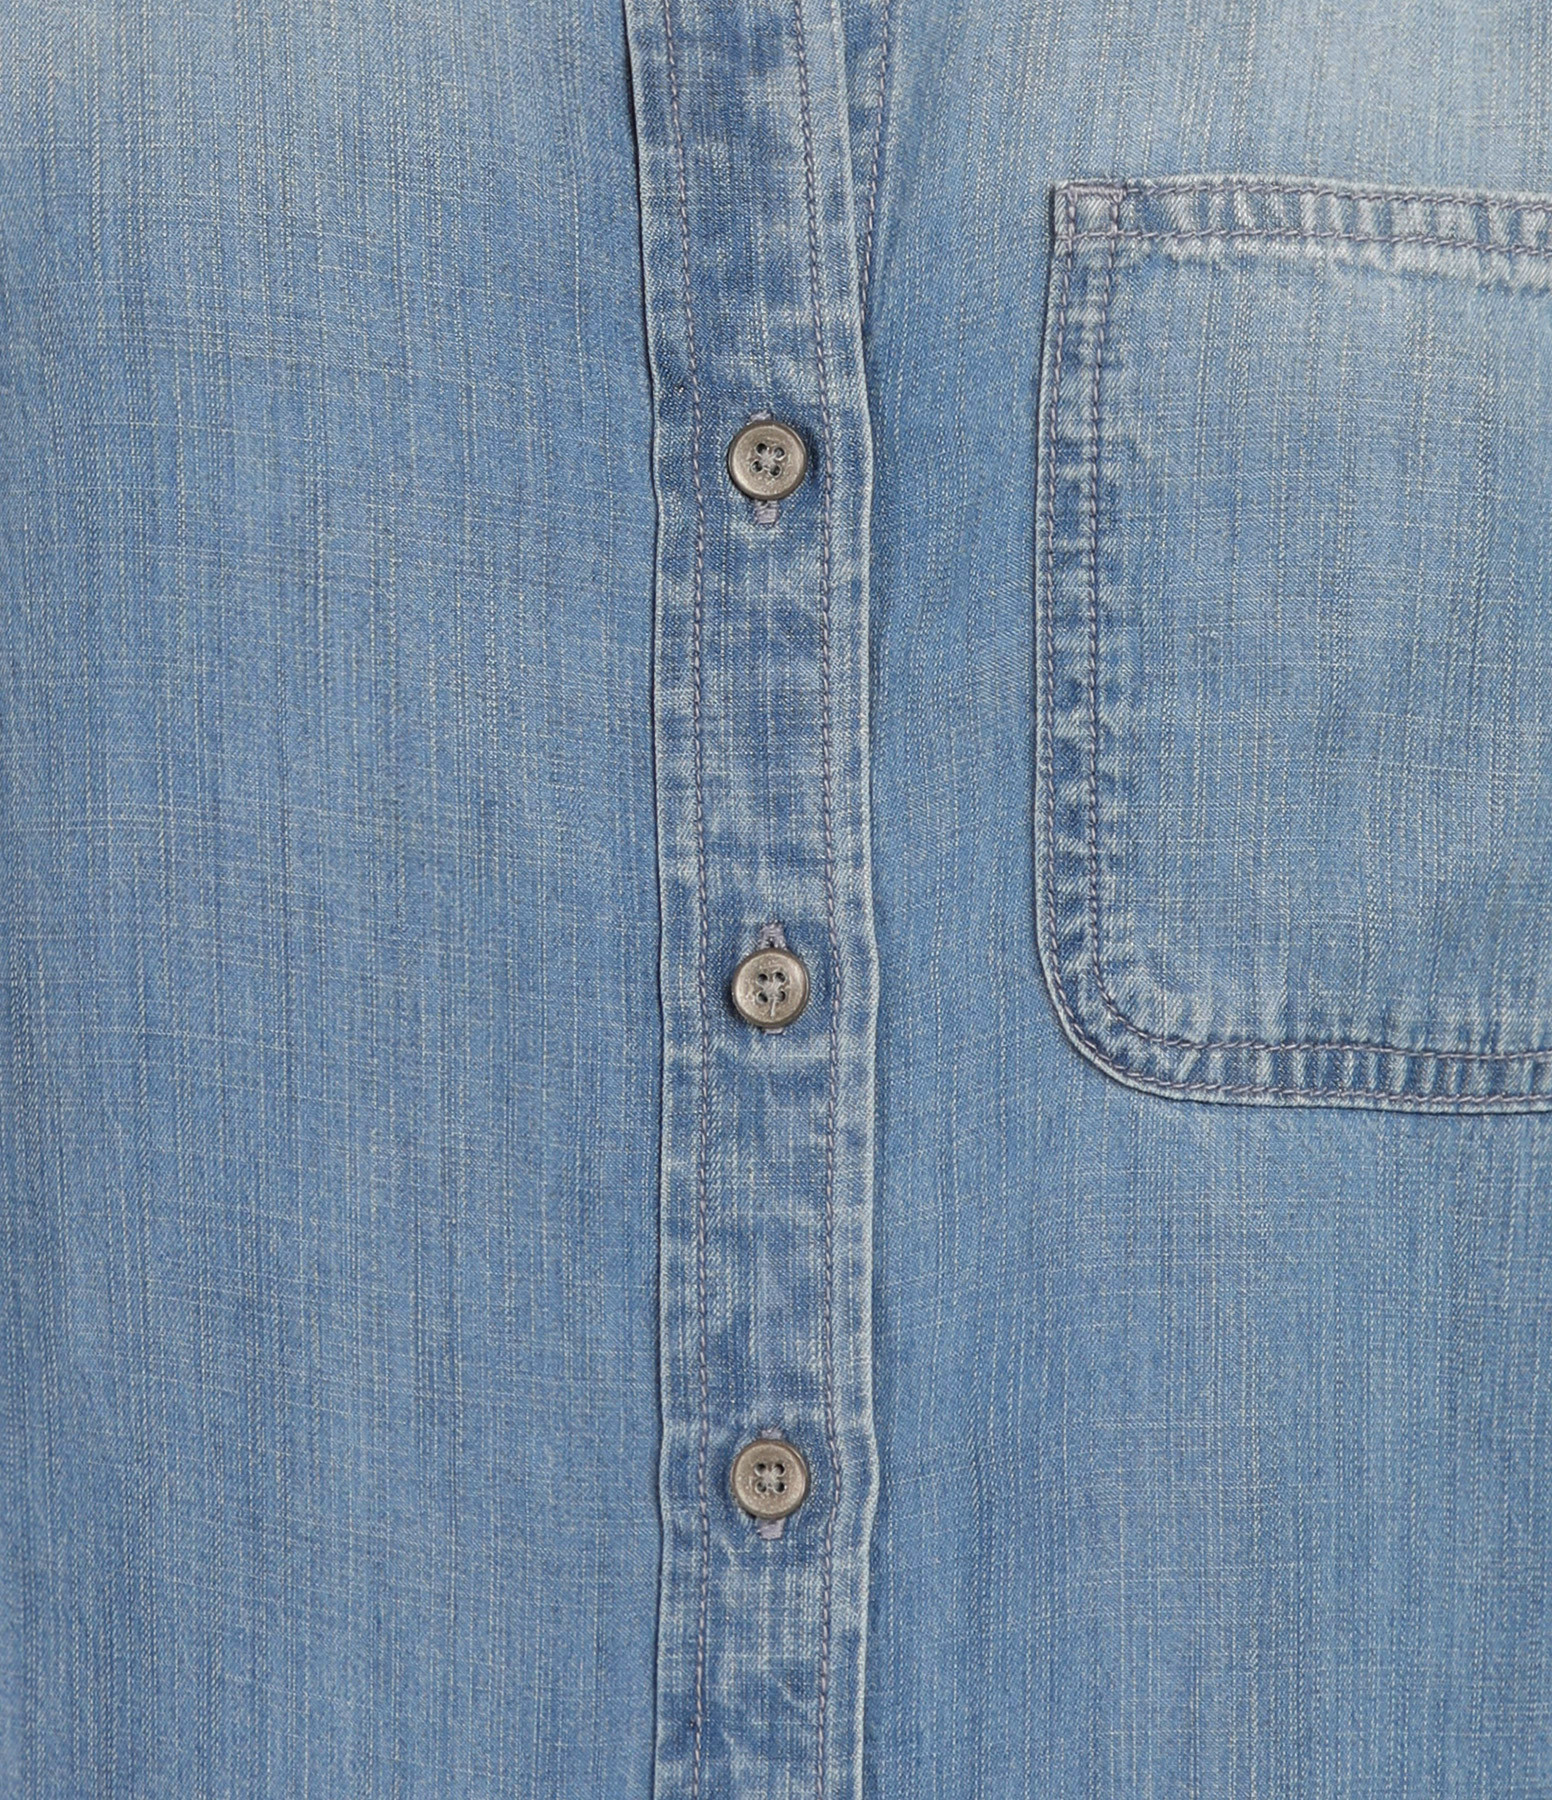 BELLA DAHL - Chemise Tail Button Down Medium Ombre